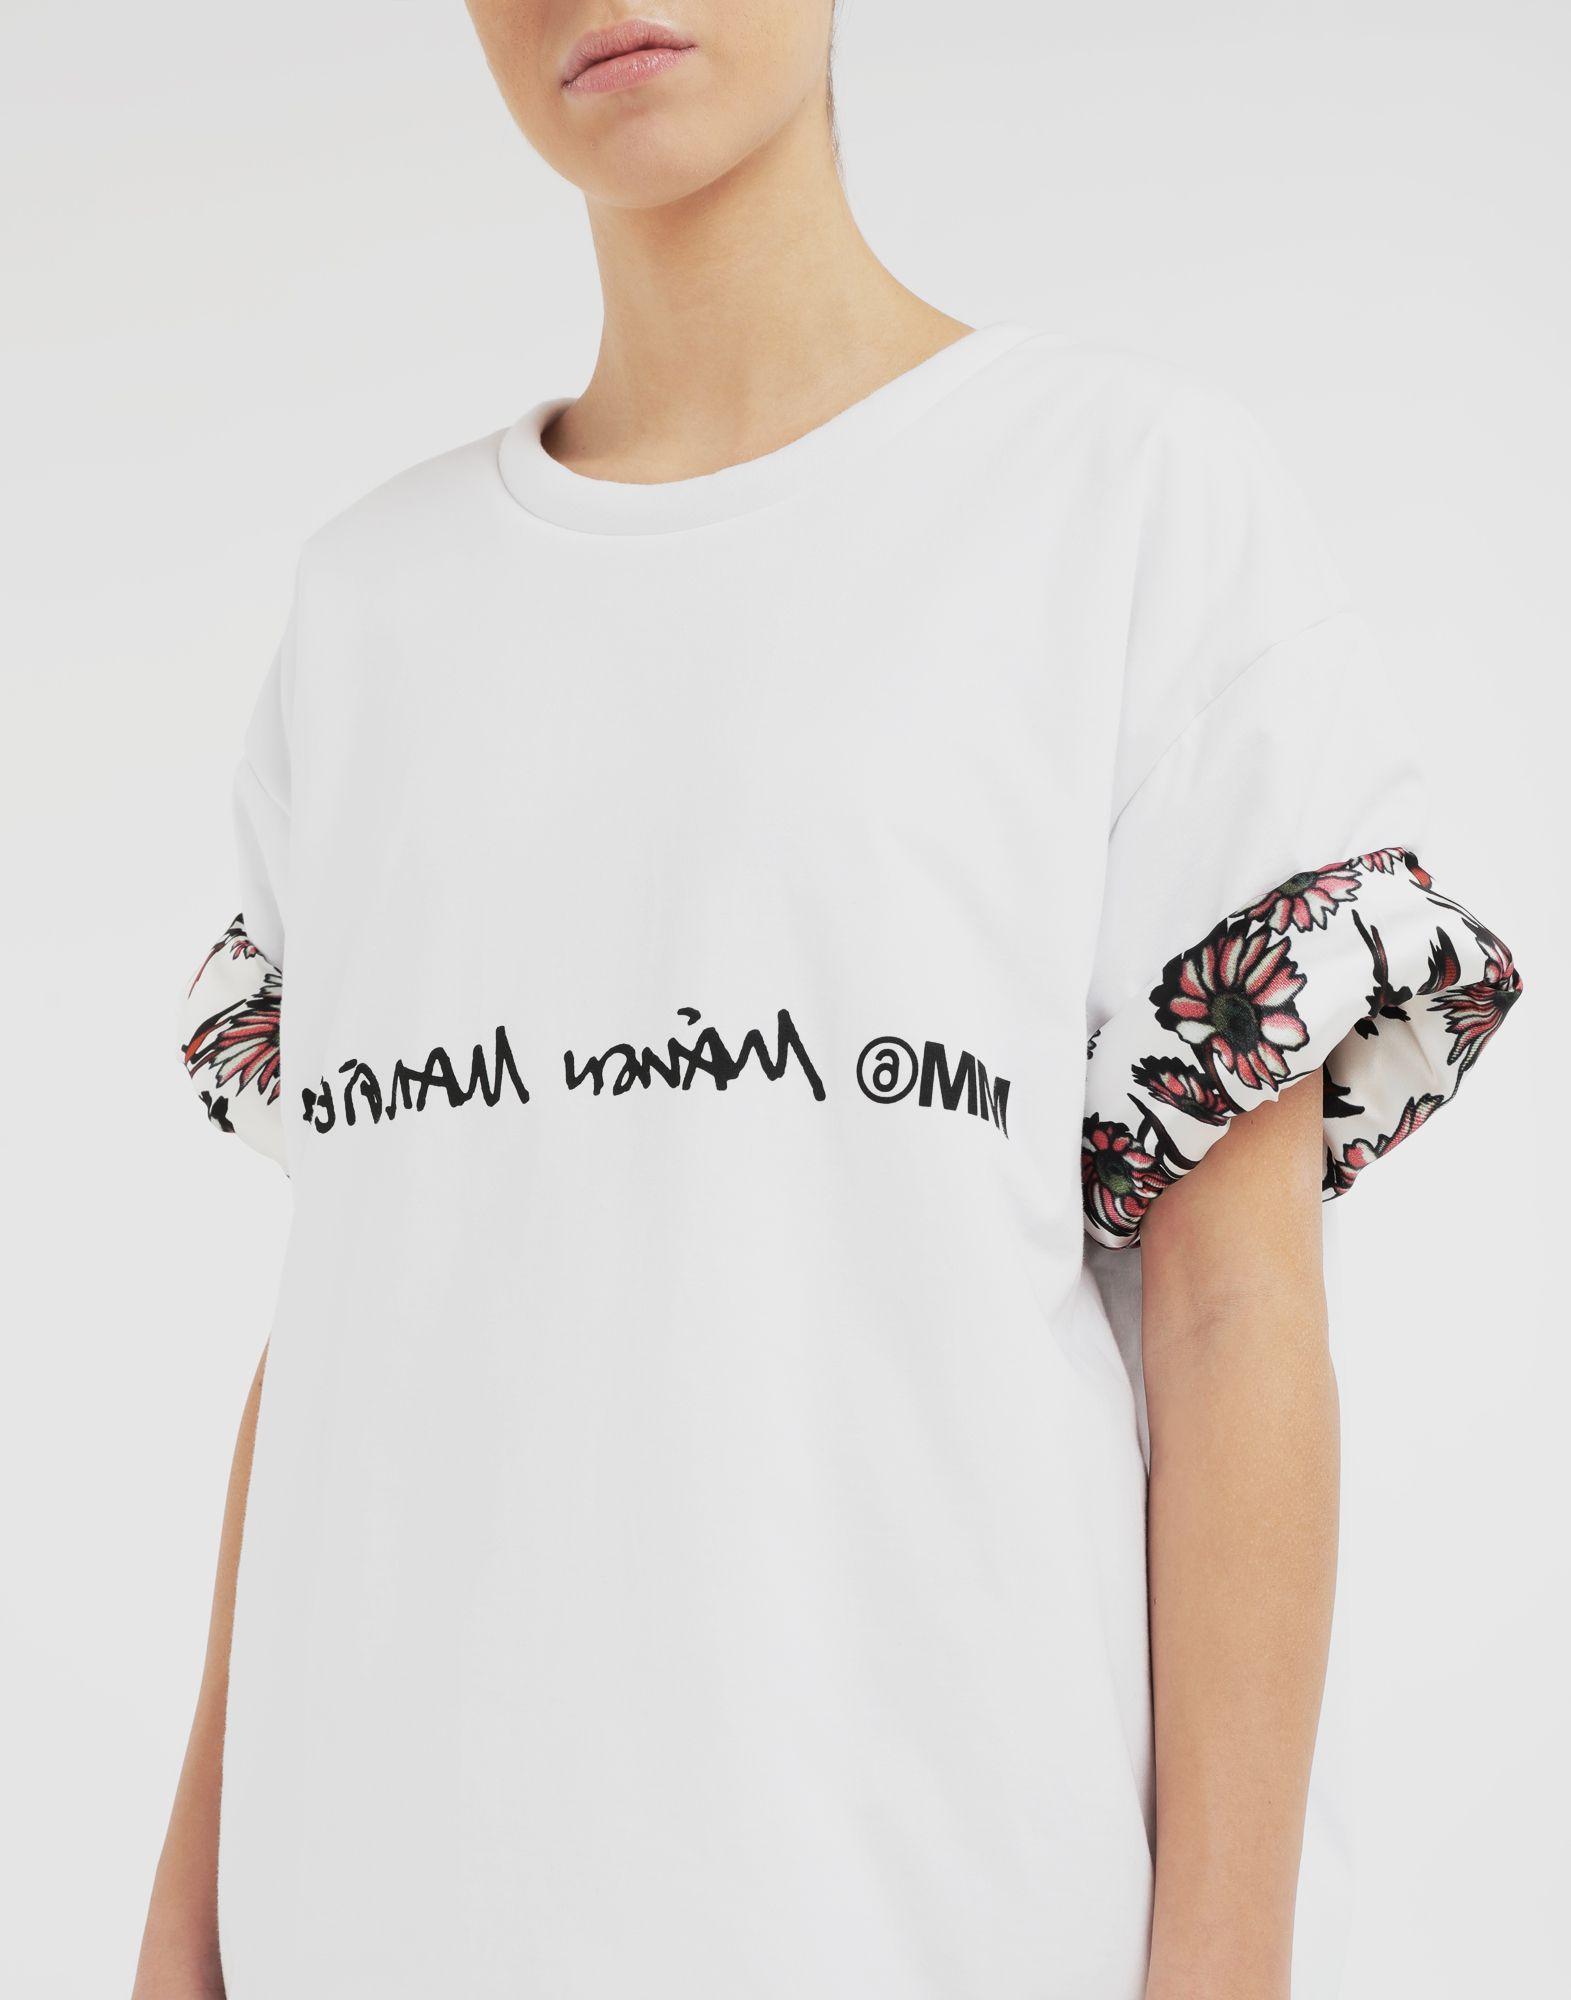 MM6 MAISON MARGIELA Двусторонняя футболка с логотипом Футболка с короткими рукавами Для Женщин b